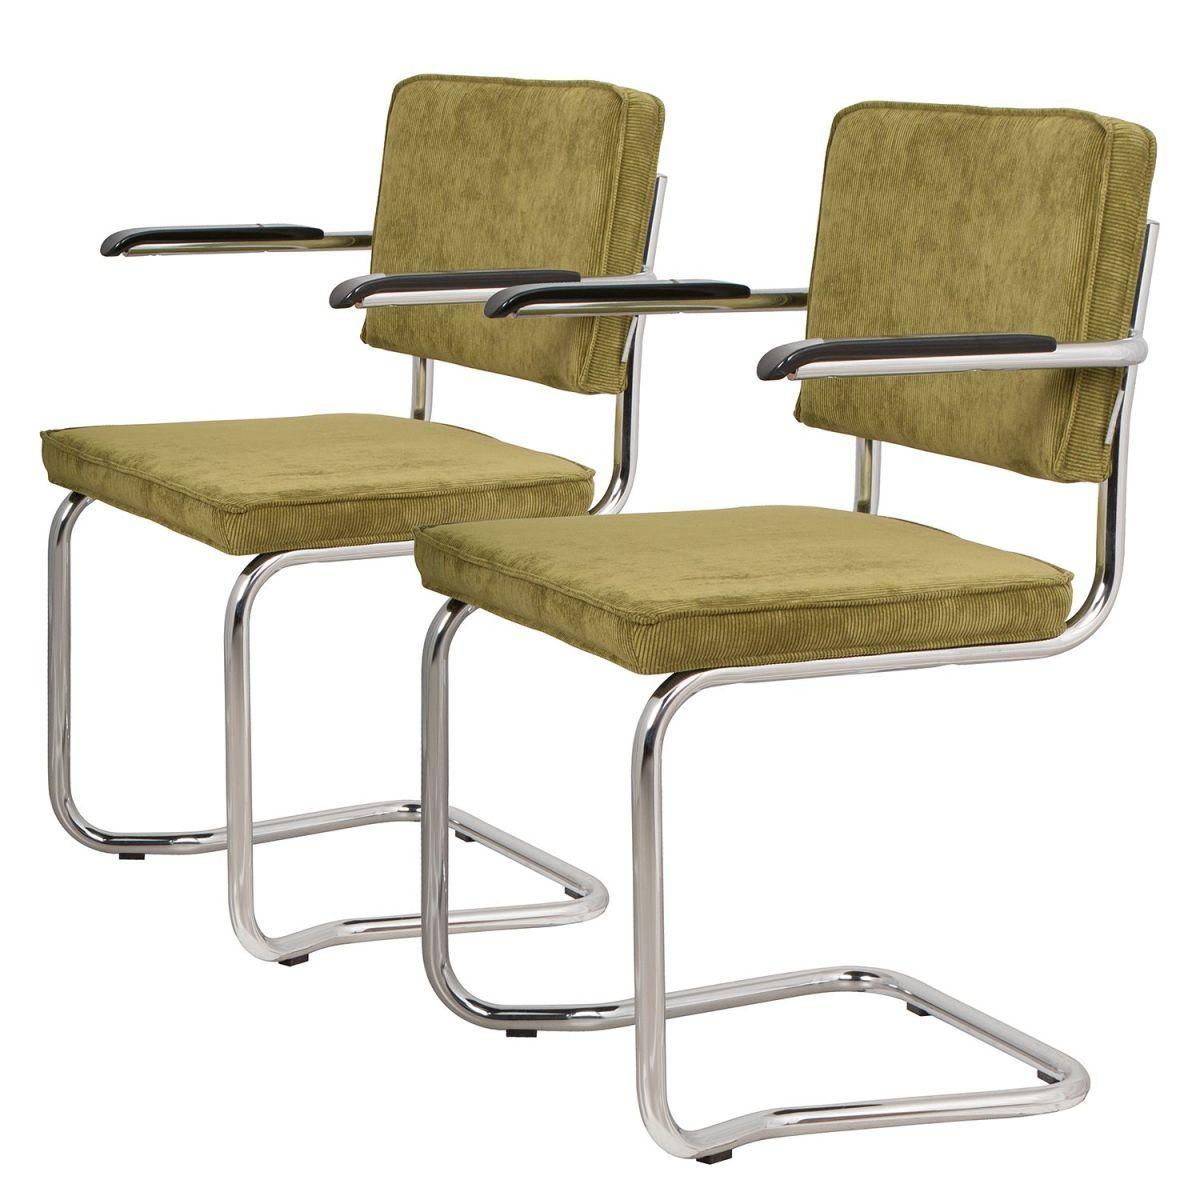 freischwinger ridge kink ii 2er set cord pistaziengr n jetzt bestellen unter https. Black Bedroom Furniture Sets. Home Design Ideas